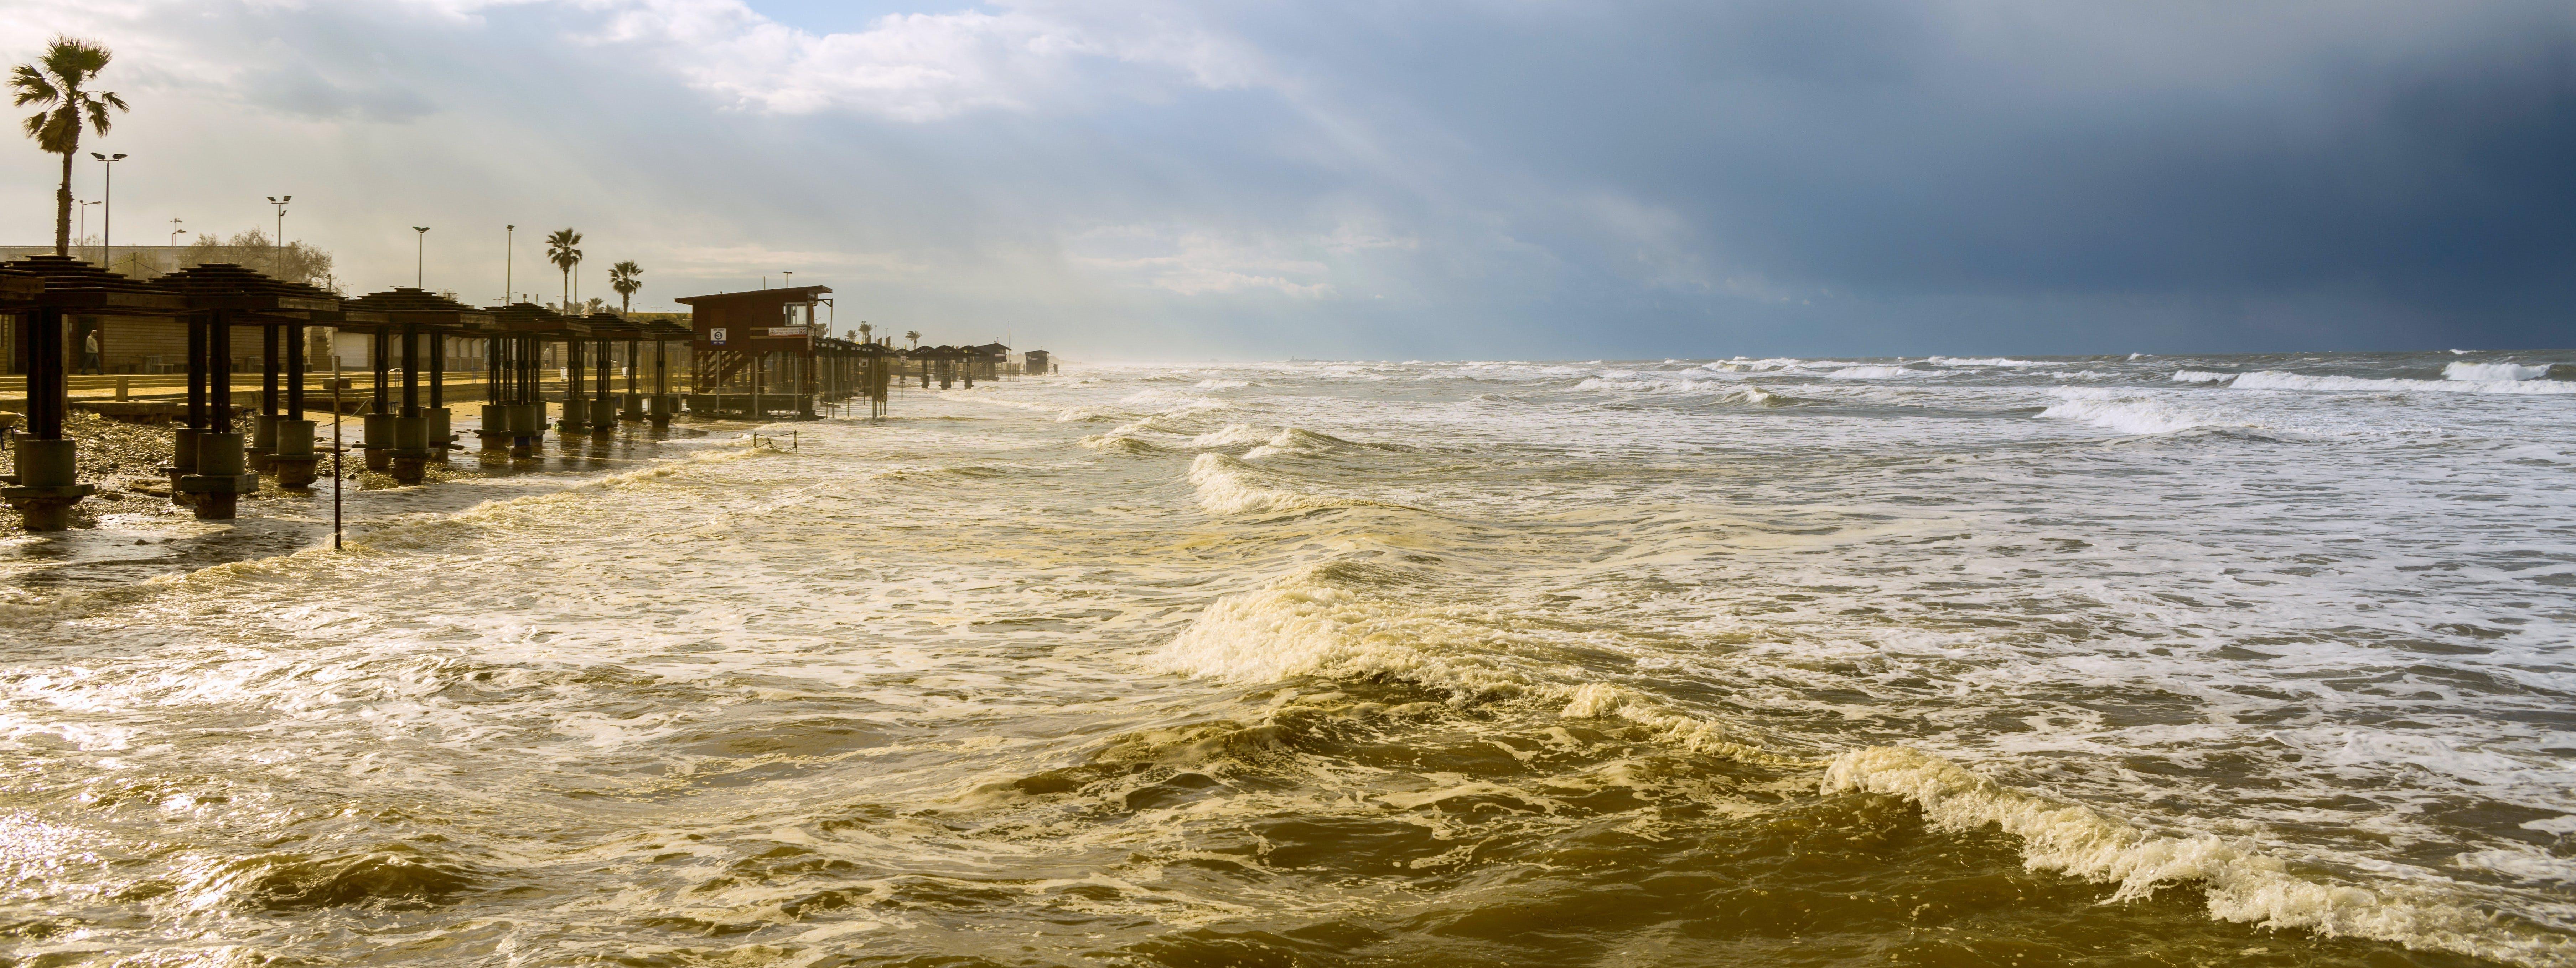 Free stock photo of bad weather, mediterranean sea, sea, seashore